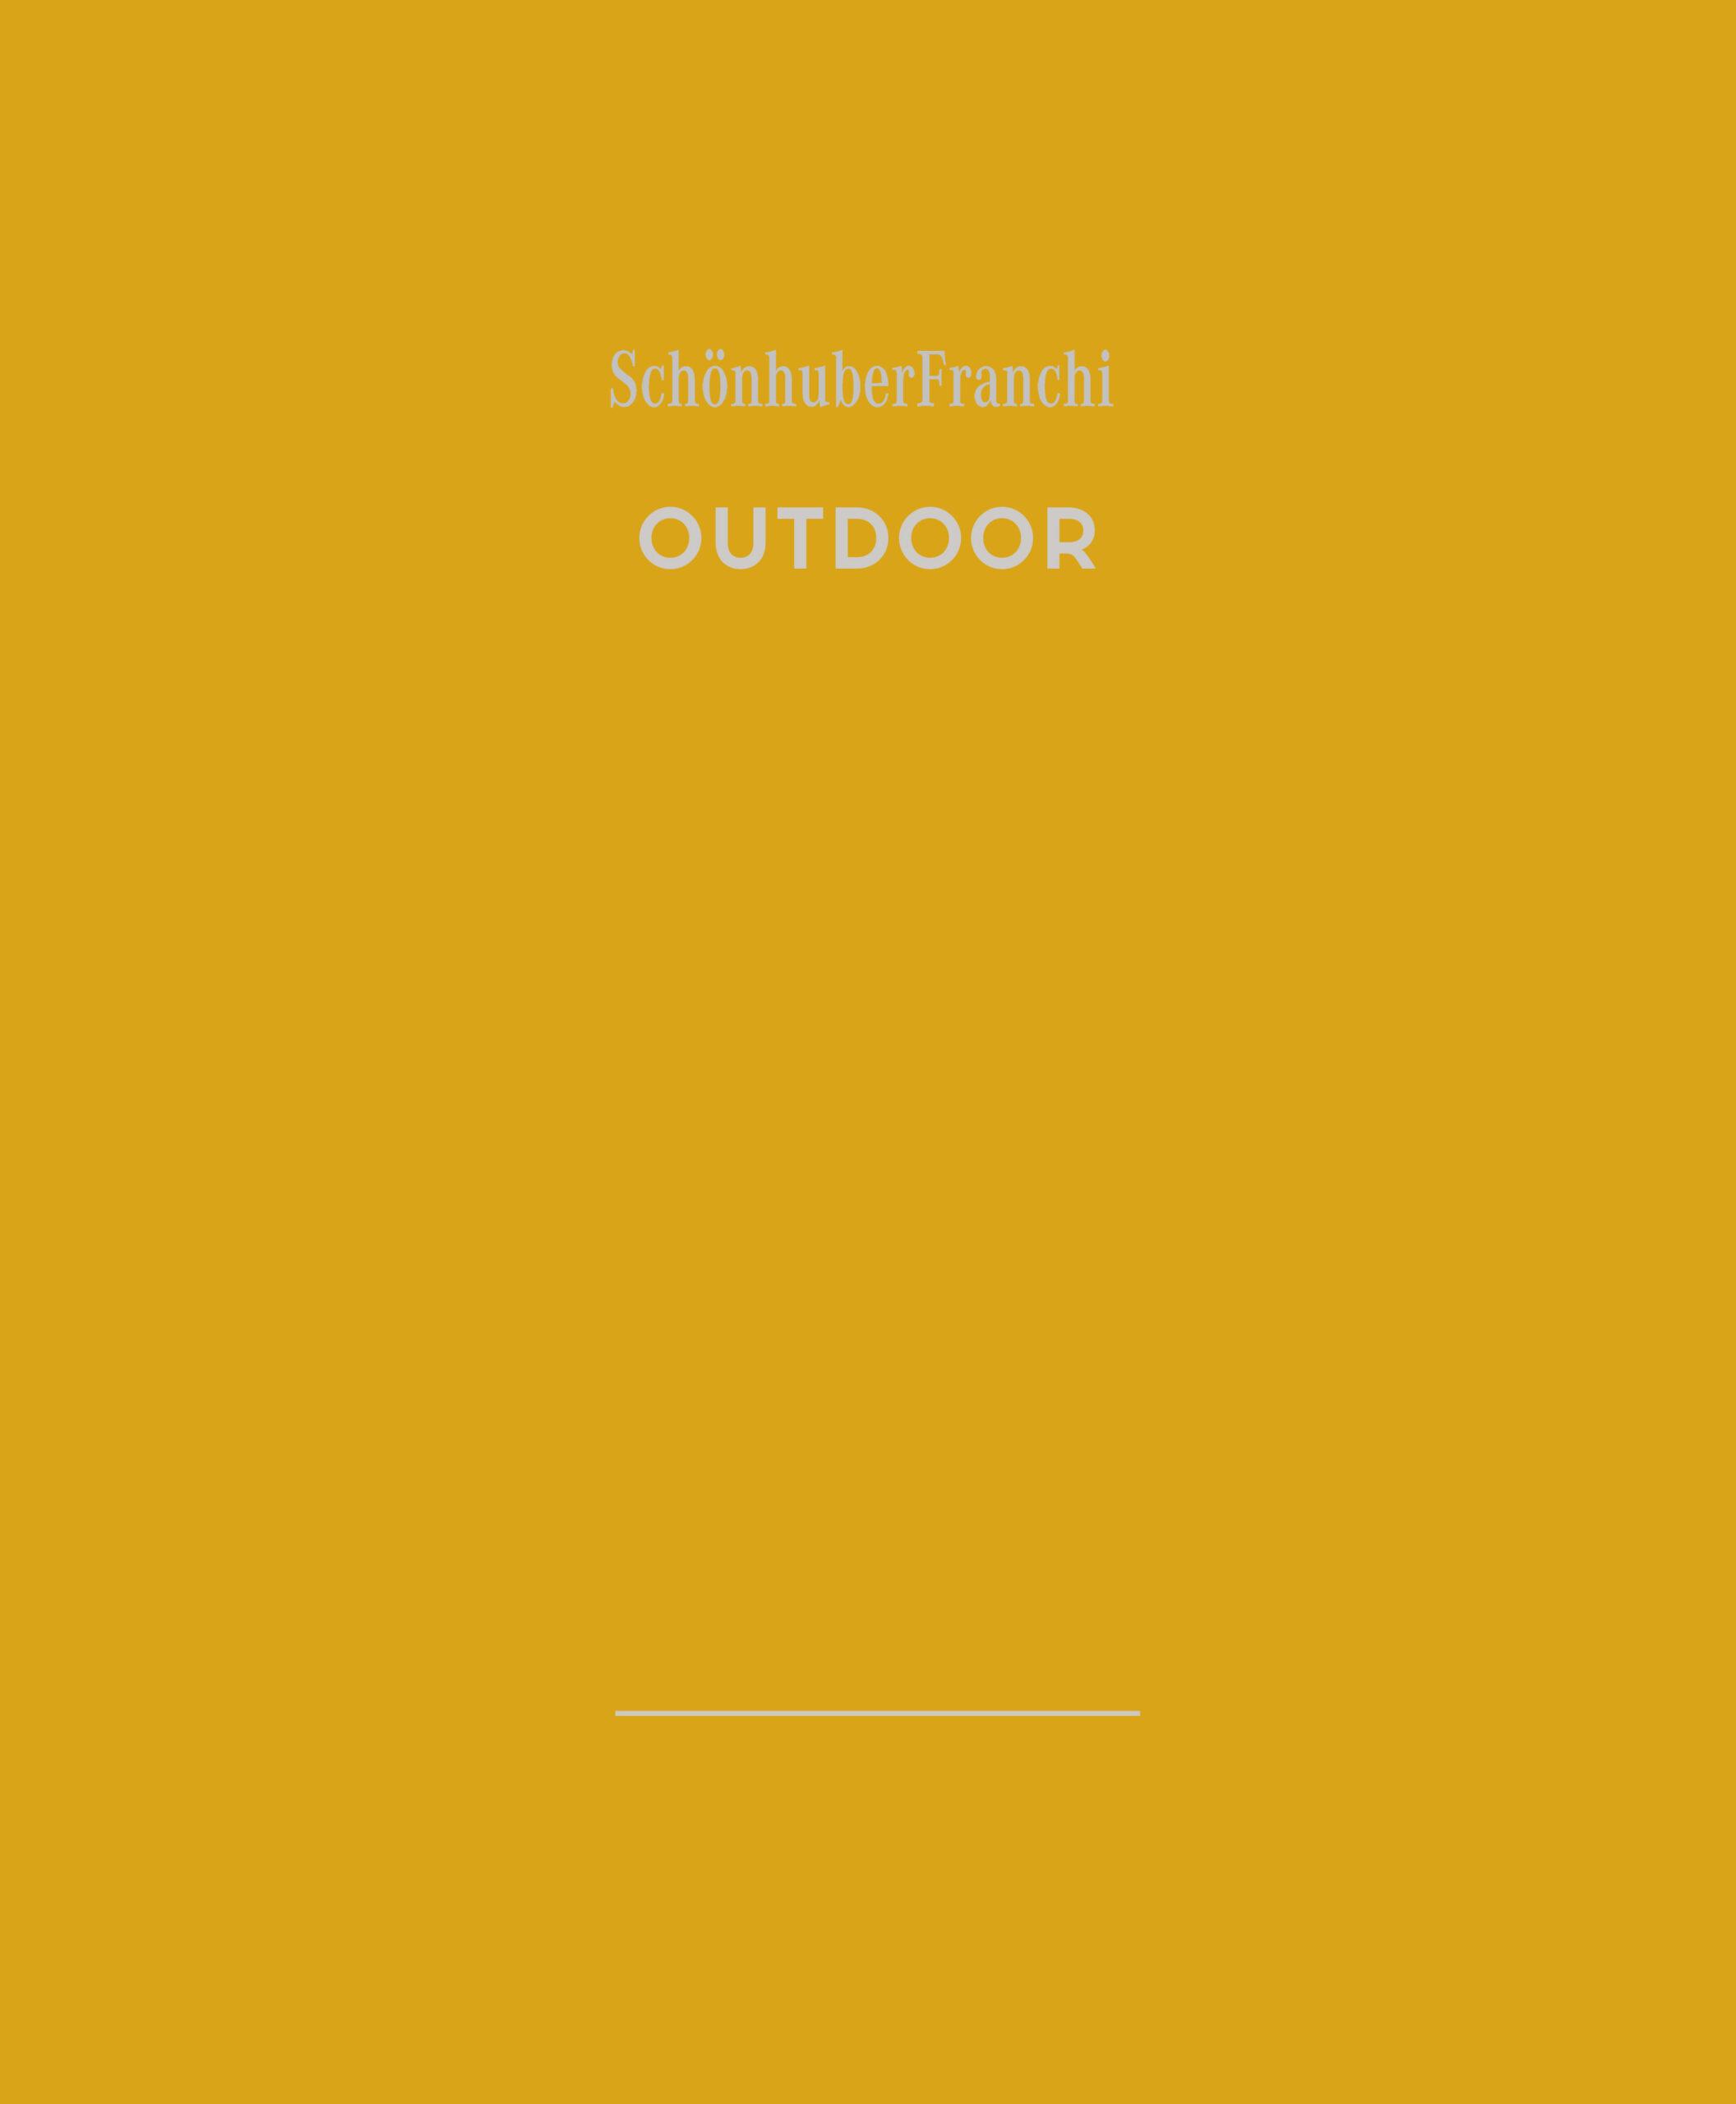 https://www.knindustrie.it/wp-content/uploads/2020/11/outdoor-2019-scaled.jpg